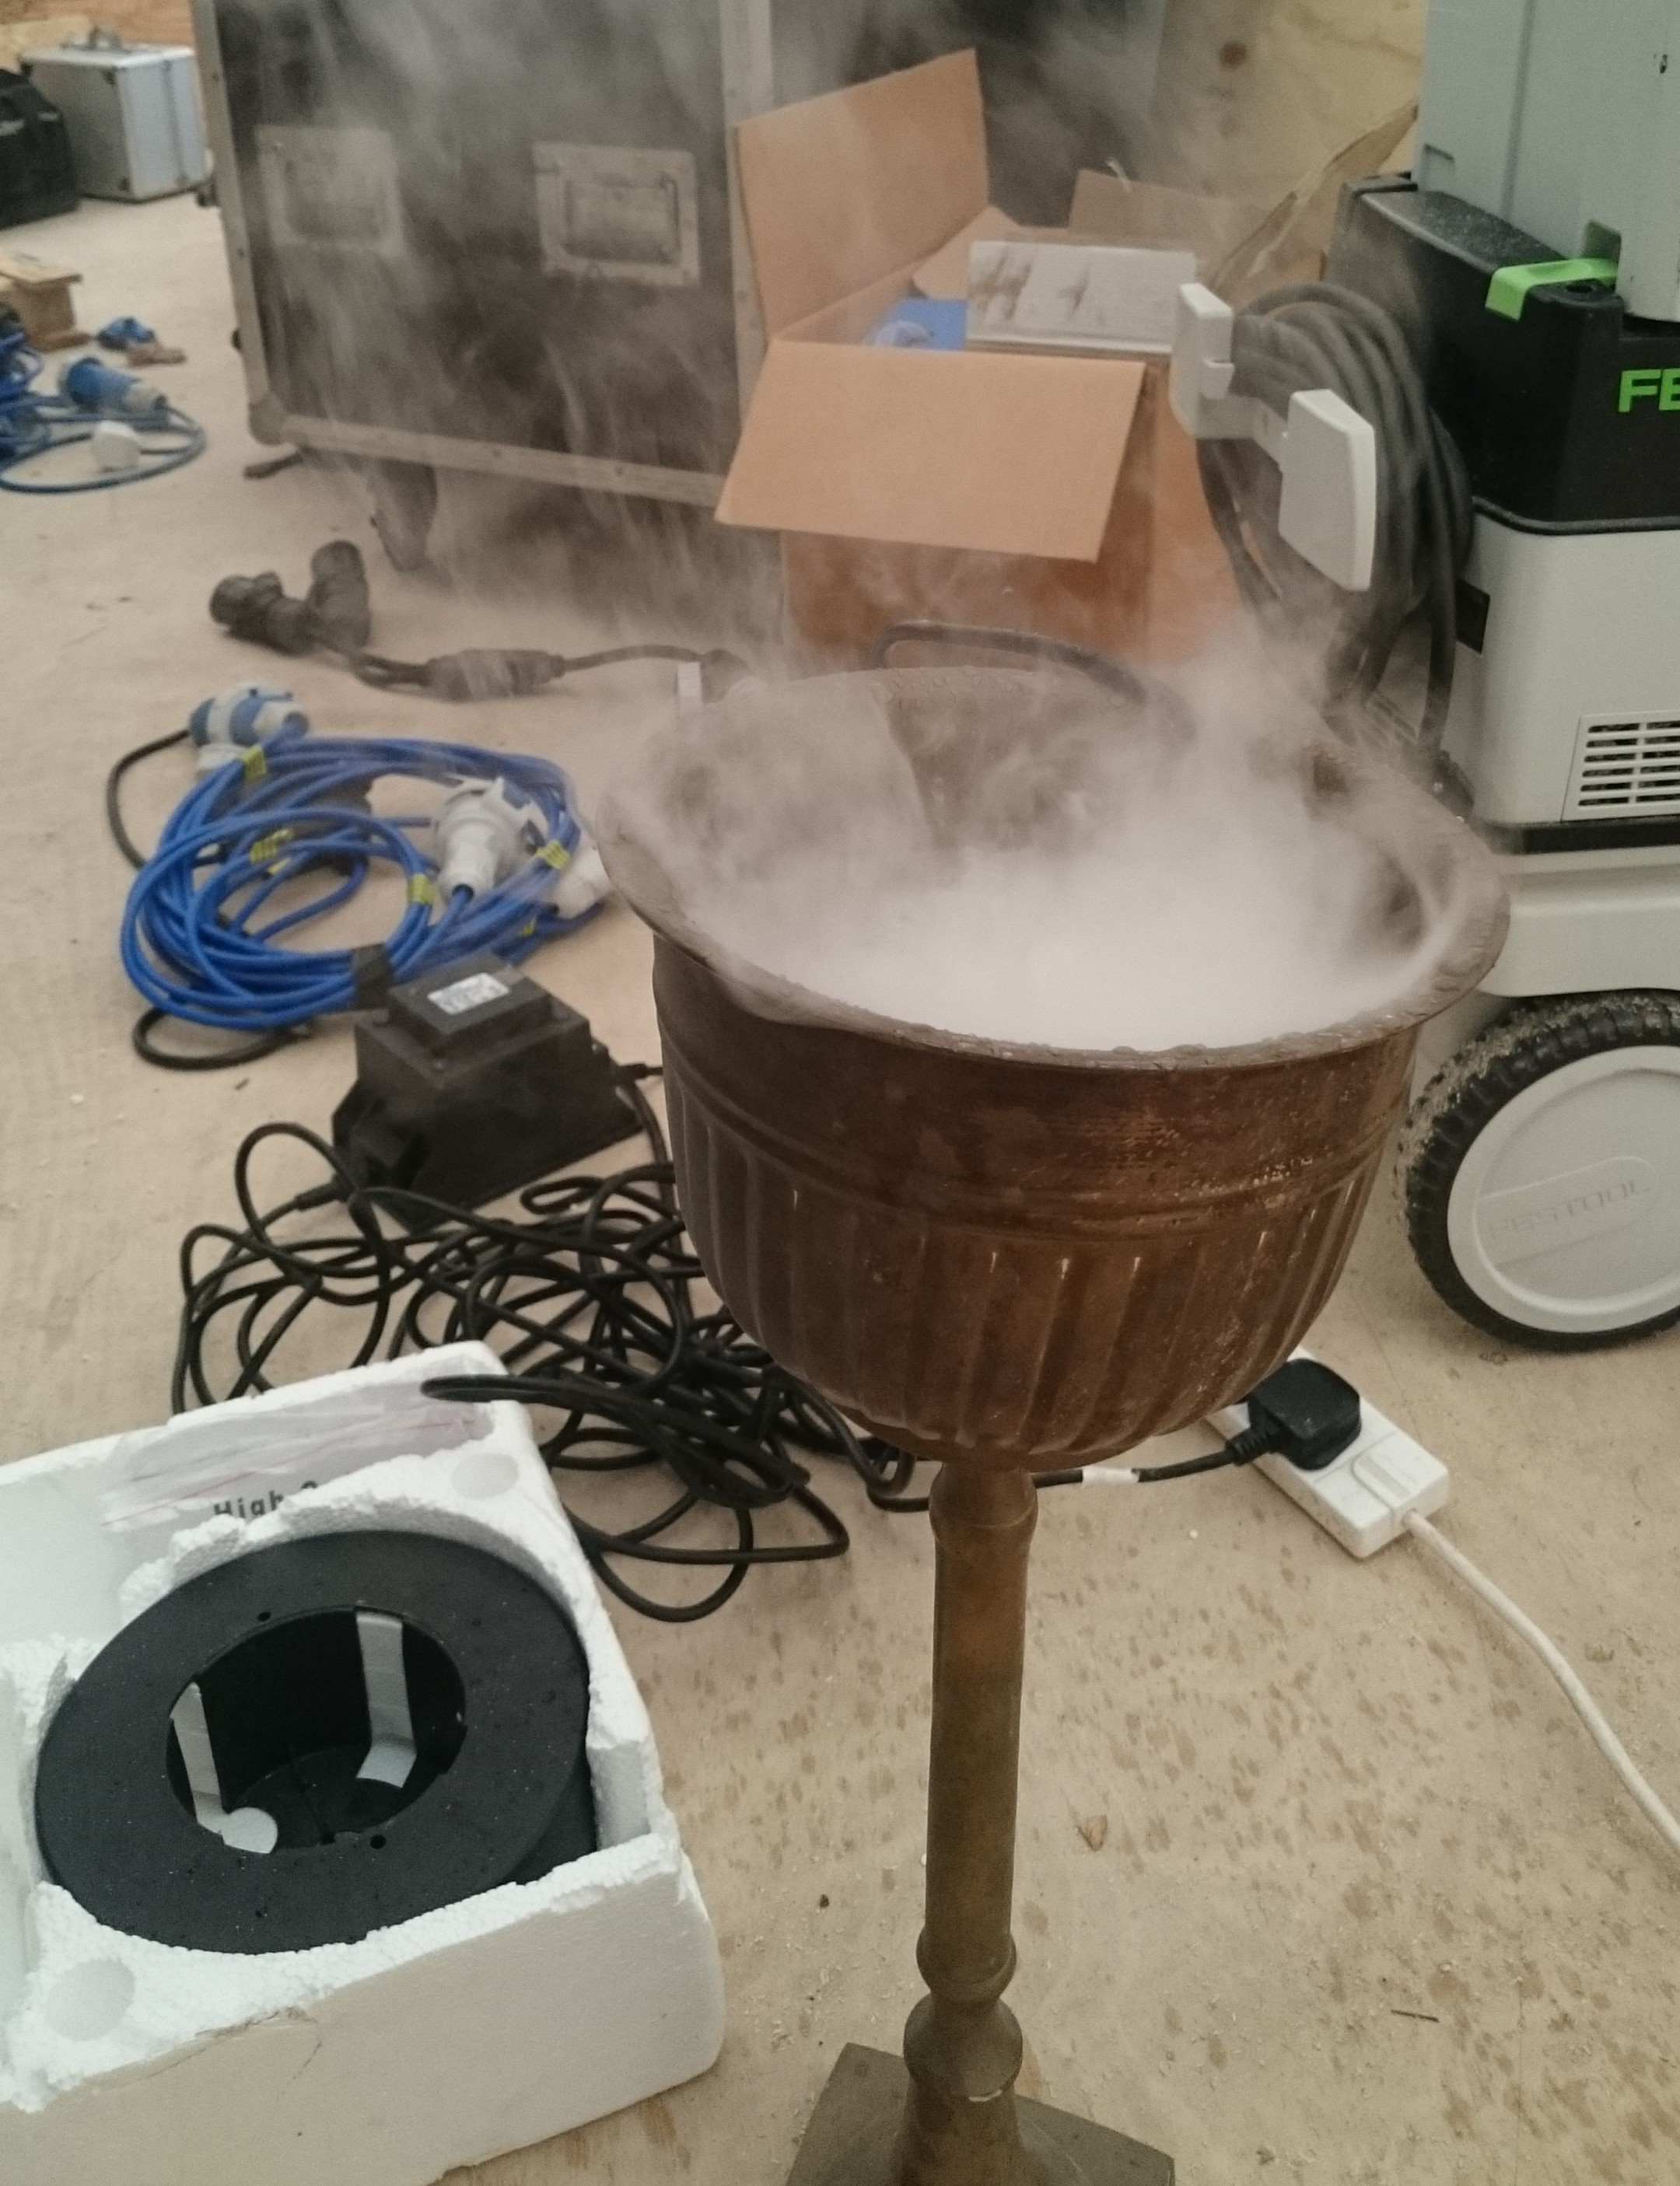 Halloweden potion testing